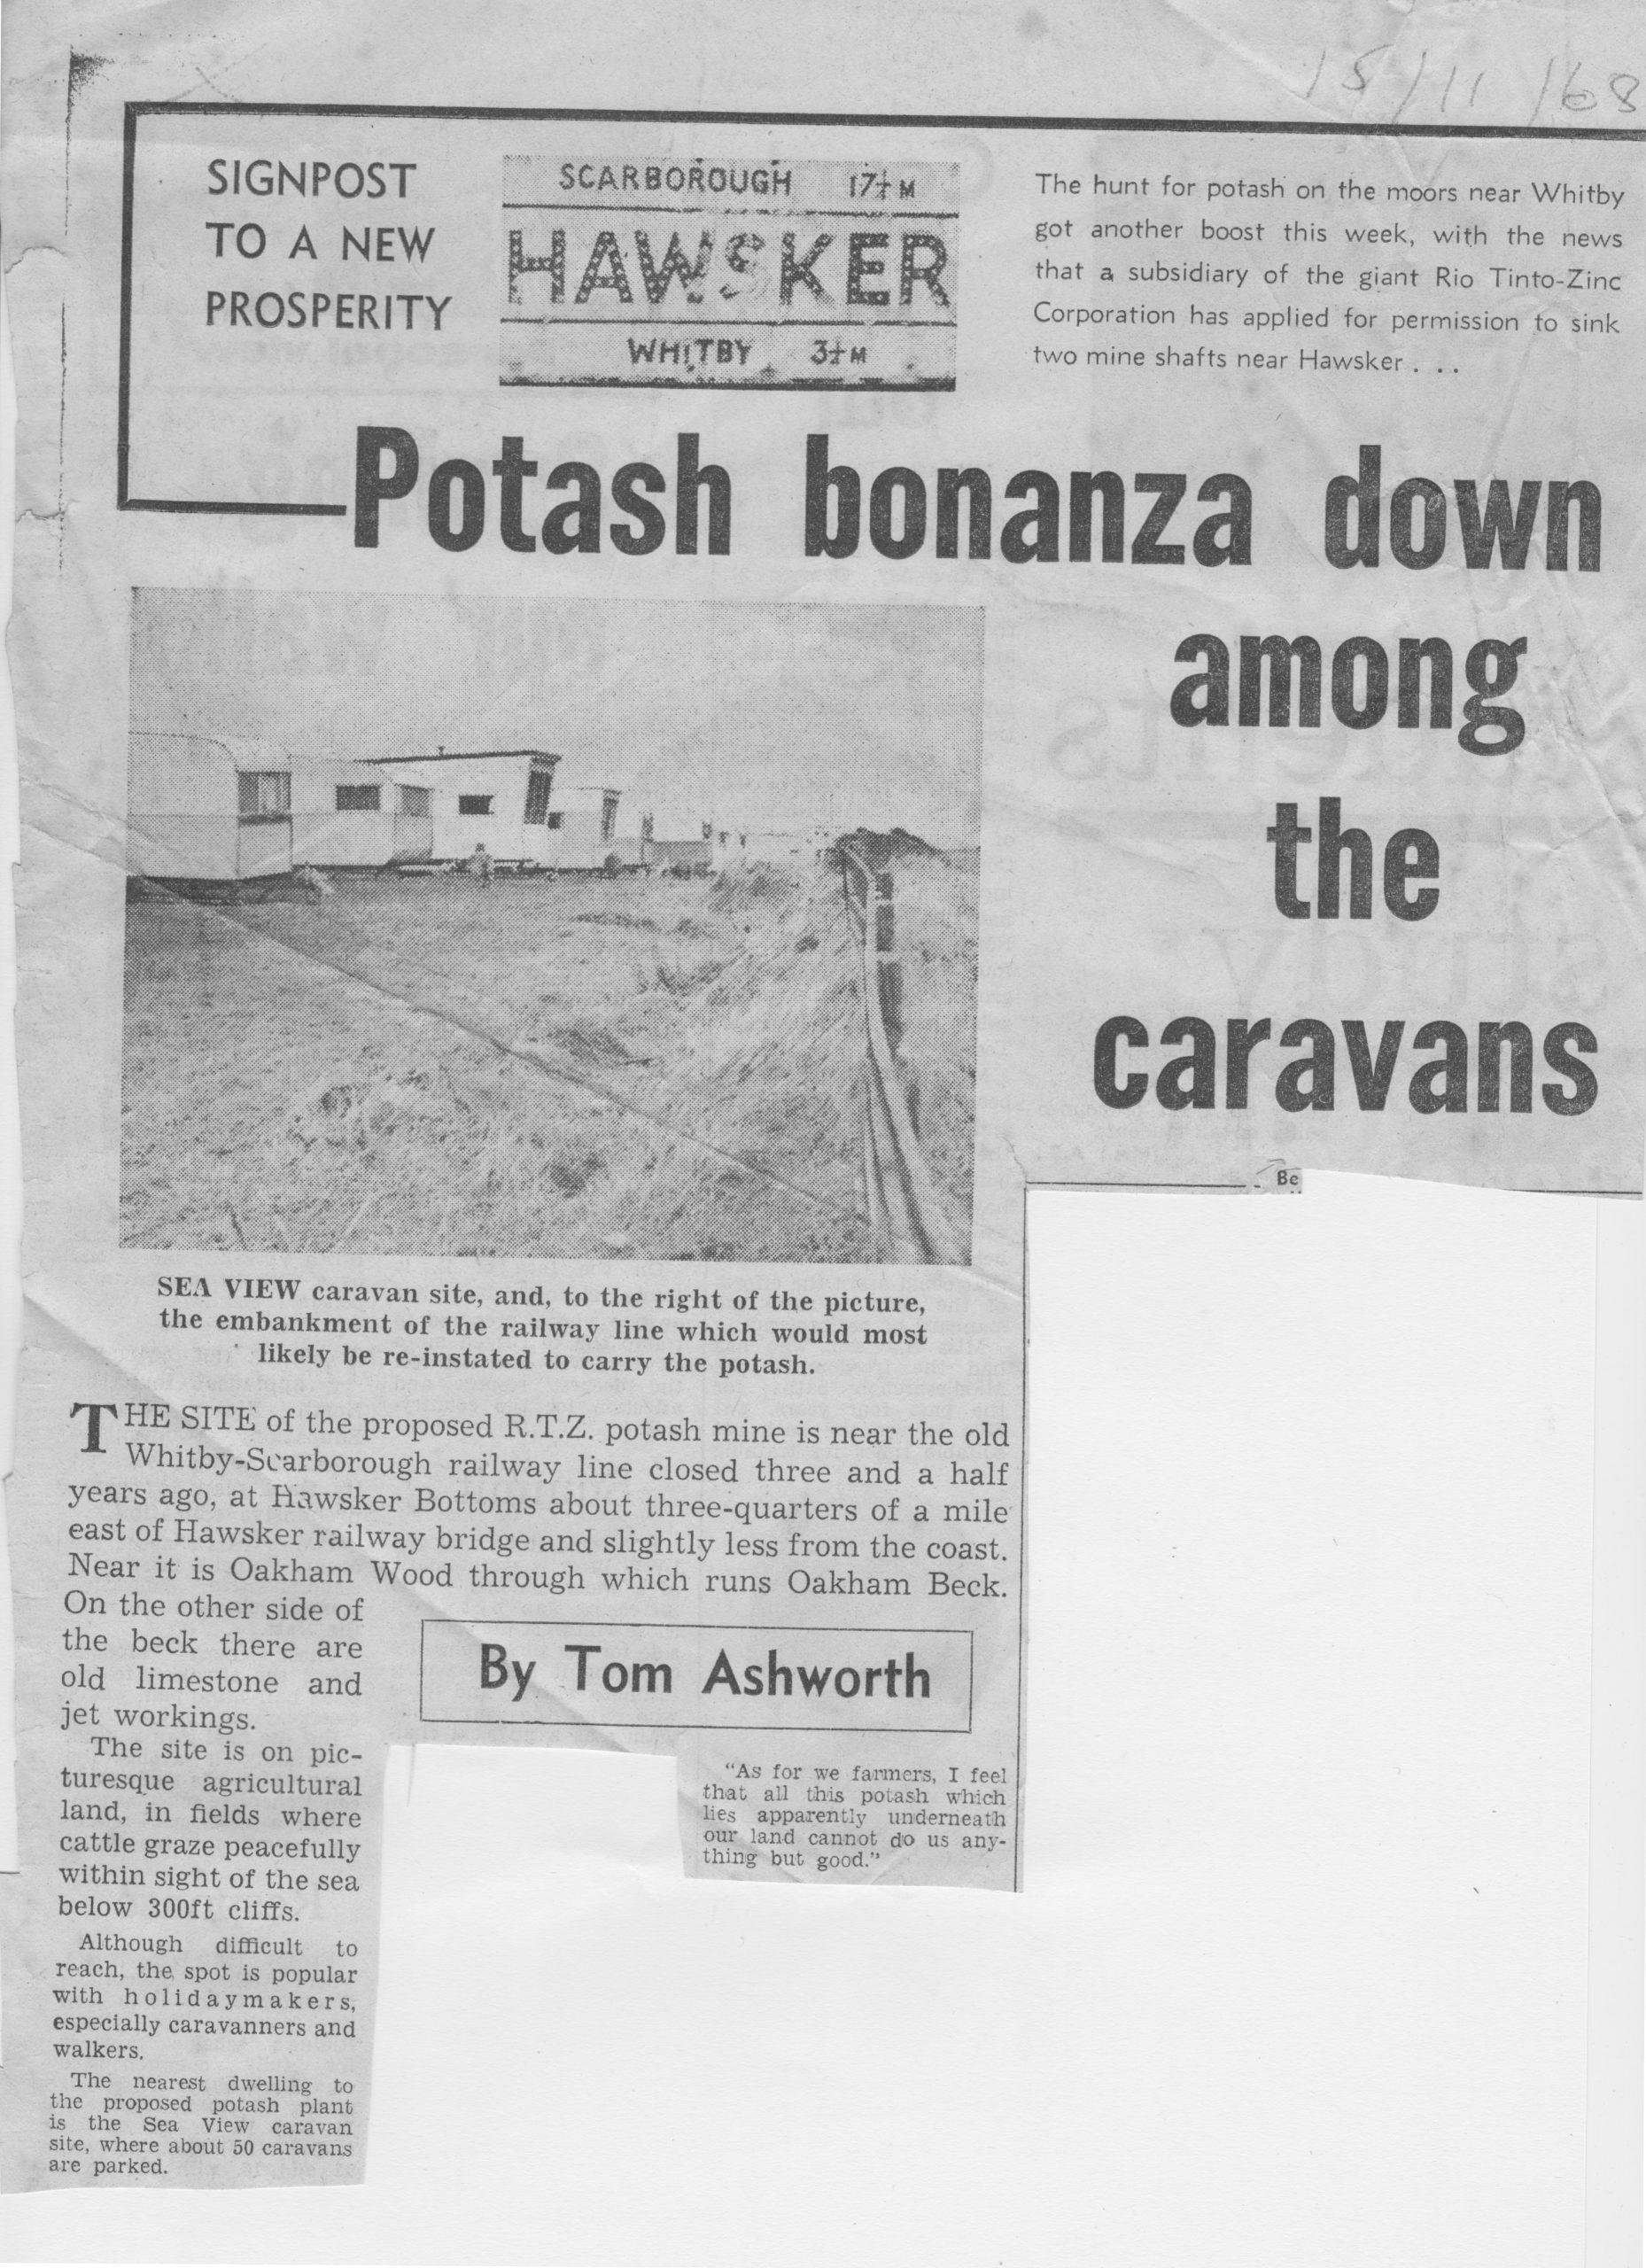 Potash mine is to be at Hawsker near caravan sites